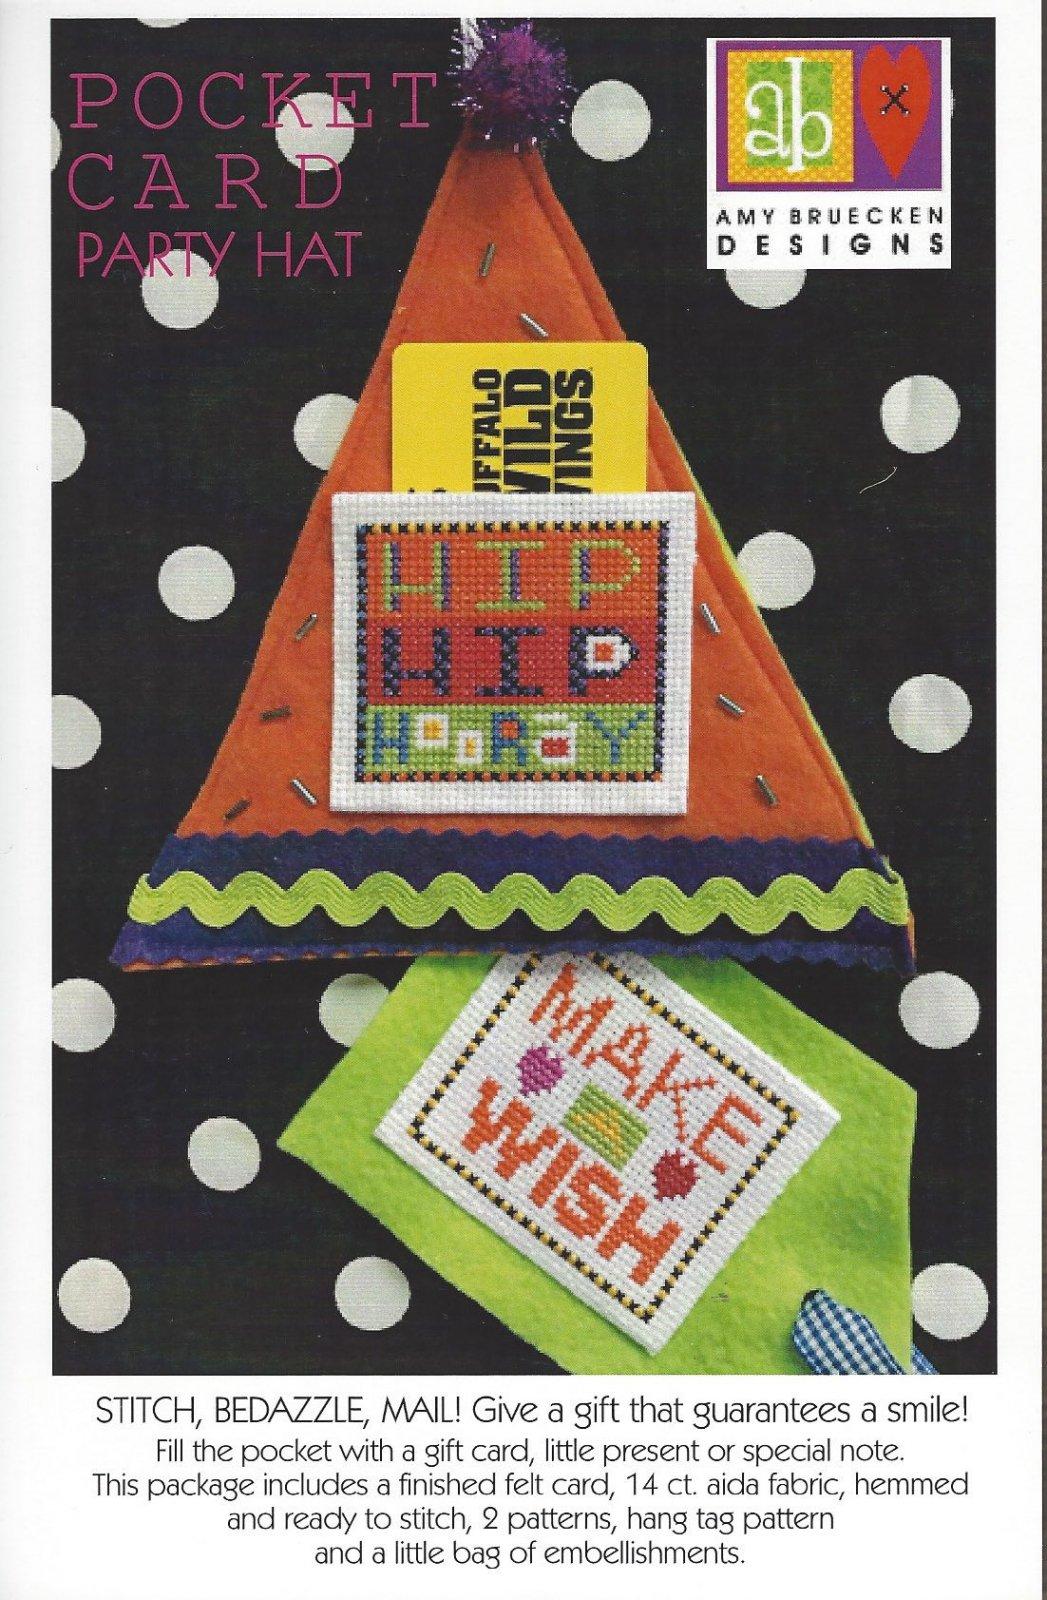 Amy Bruecken Pocket Card Party Hat